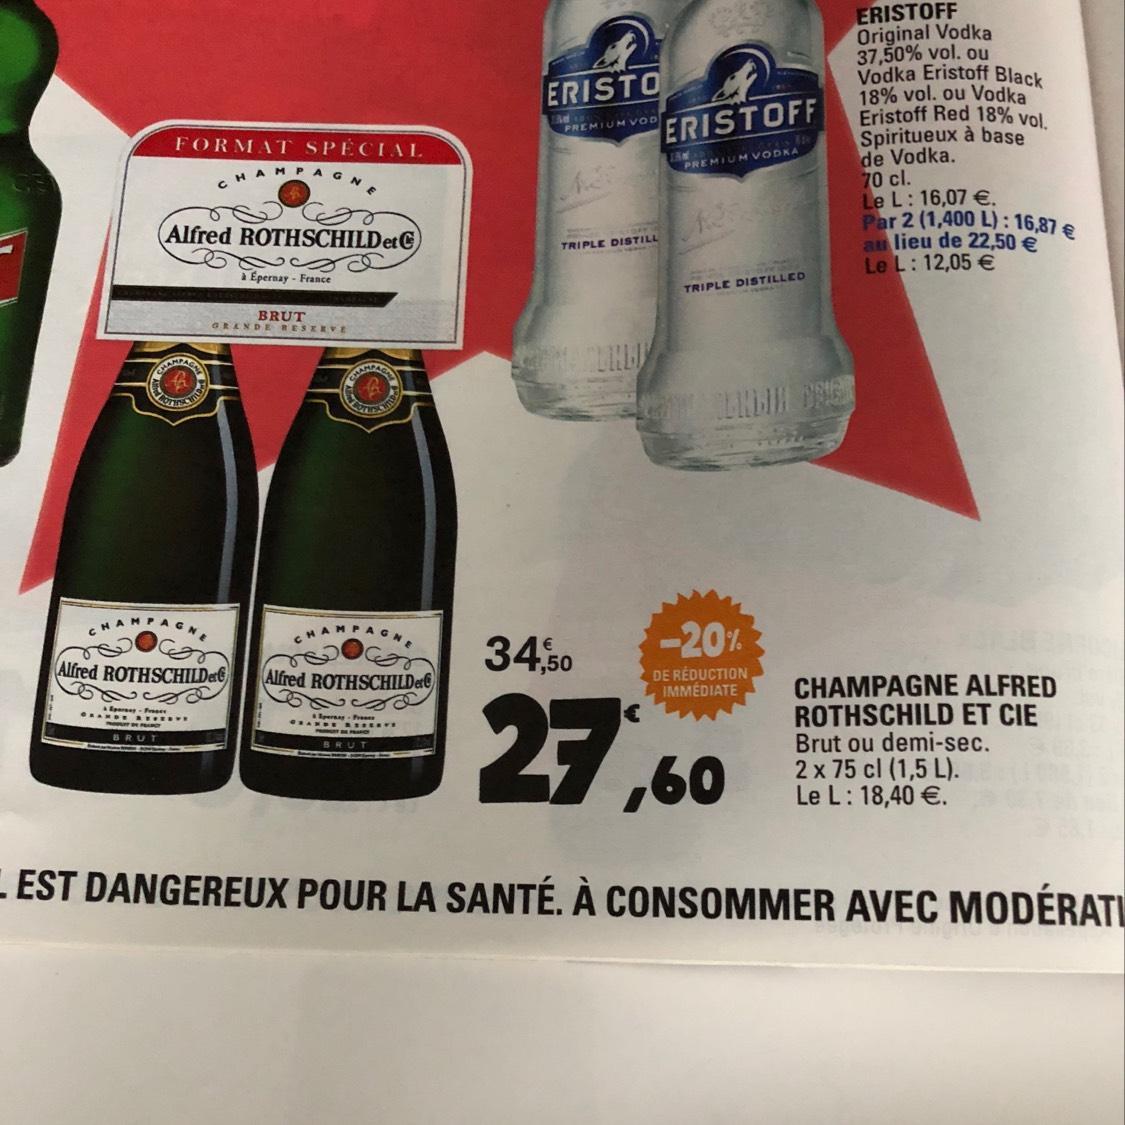 Champagne Alfred Rothschild et Cie 2 x 75 Cl